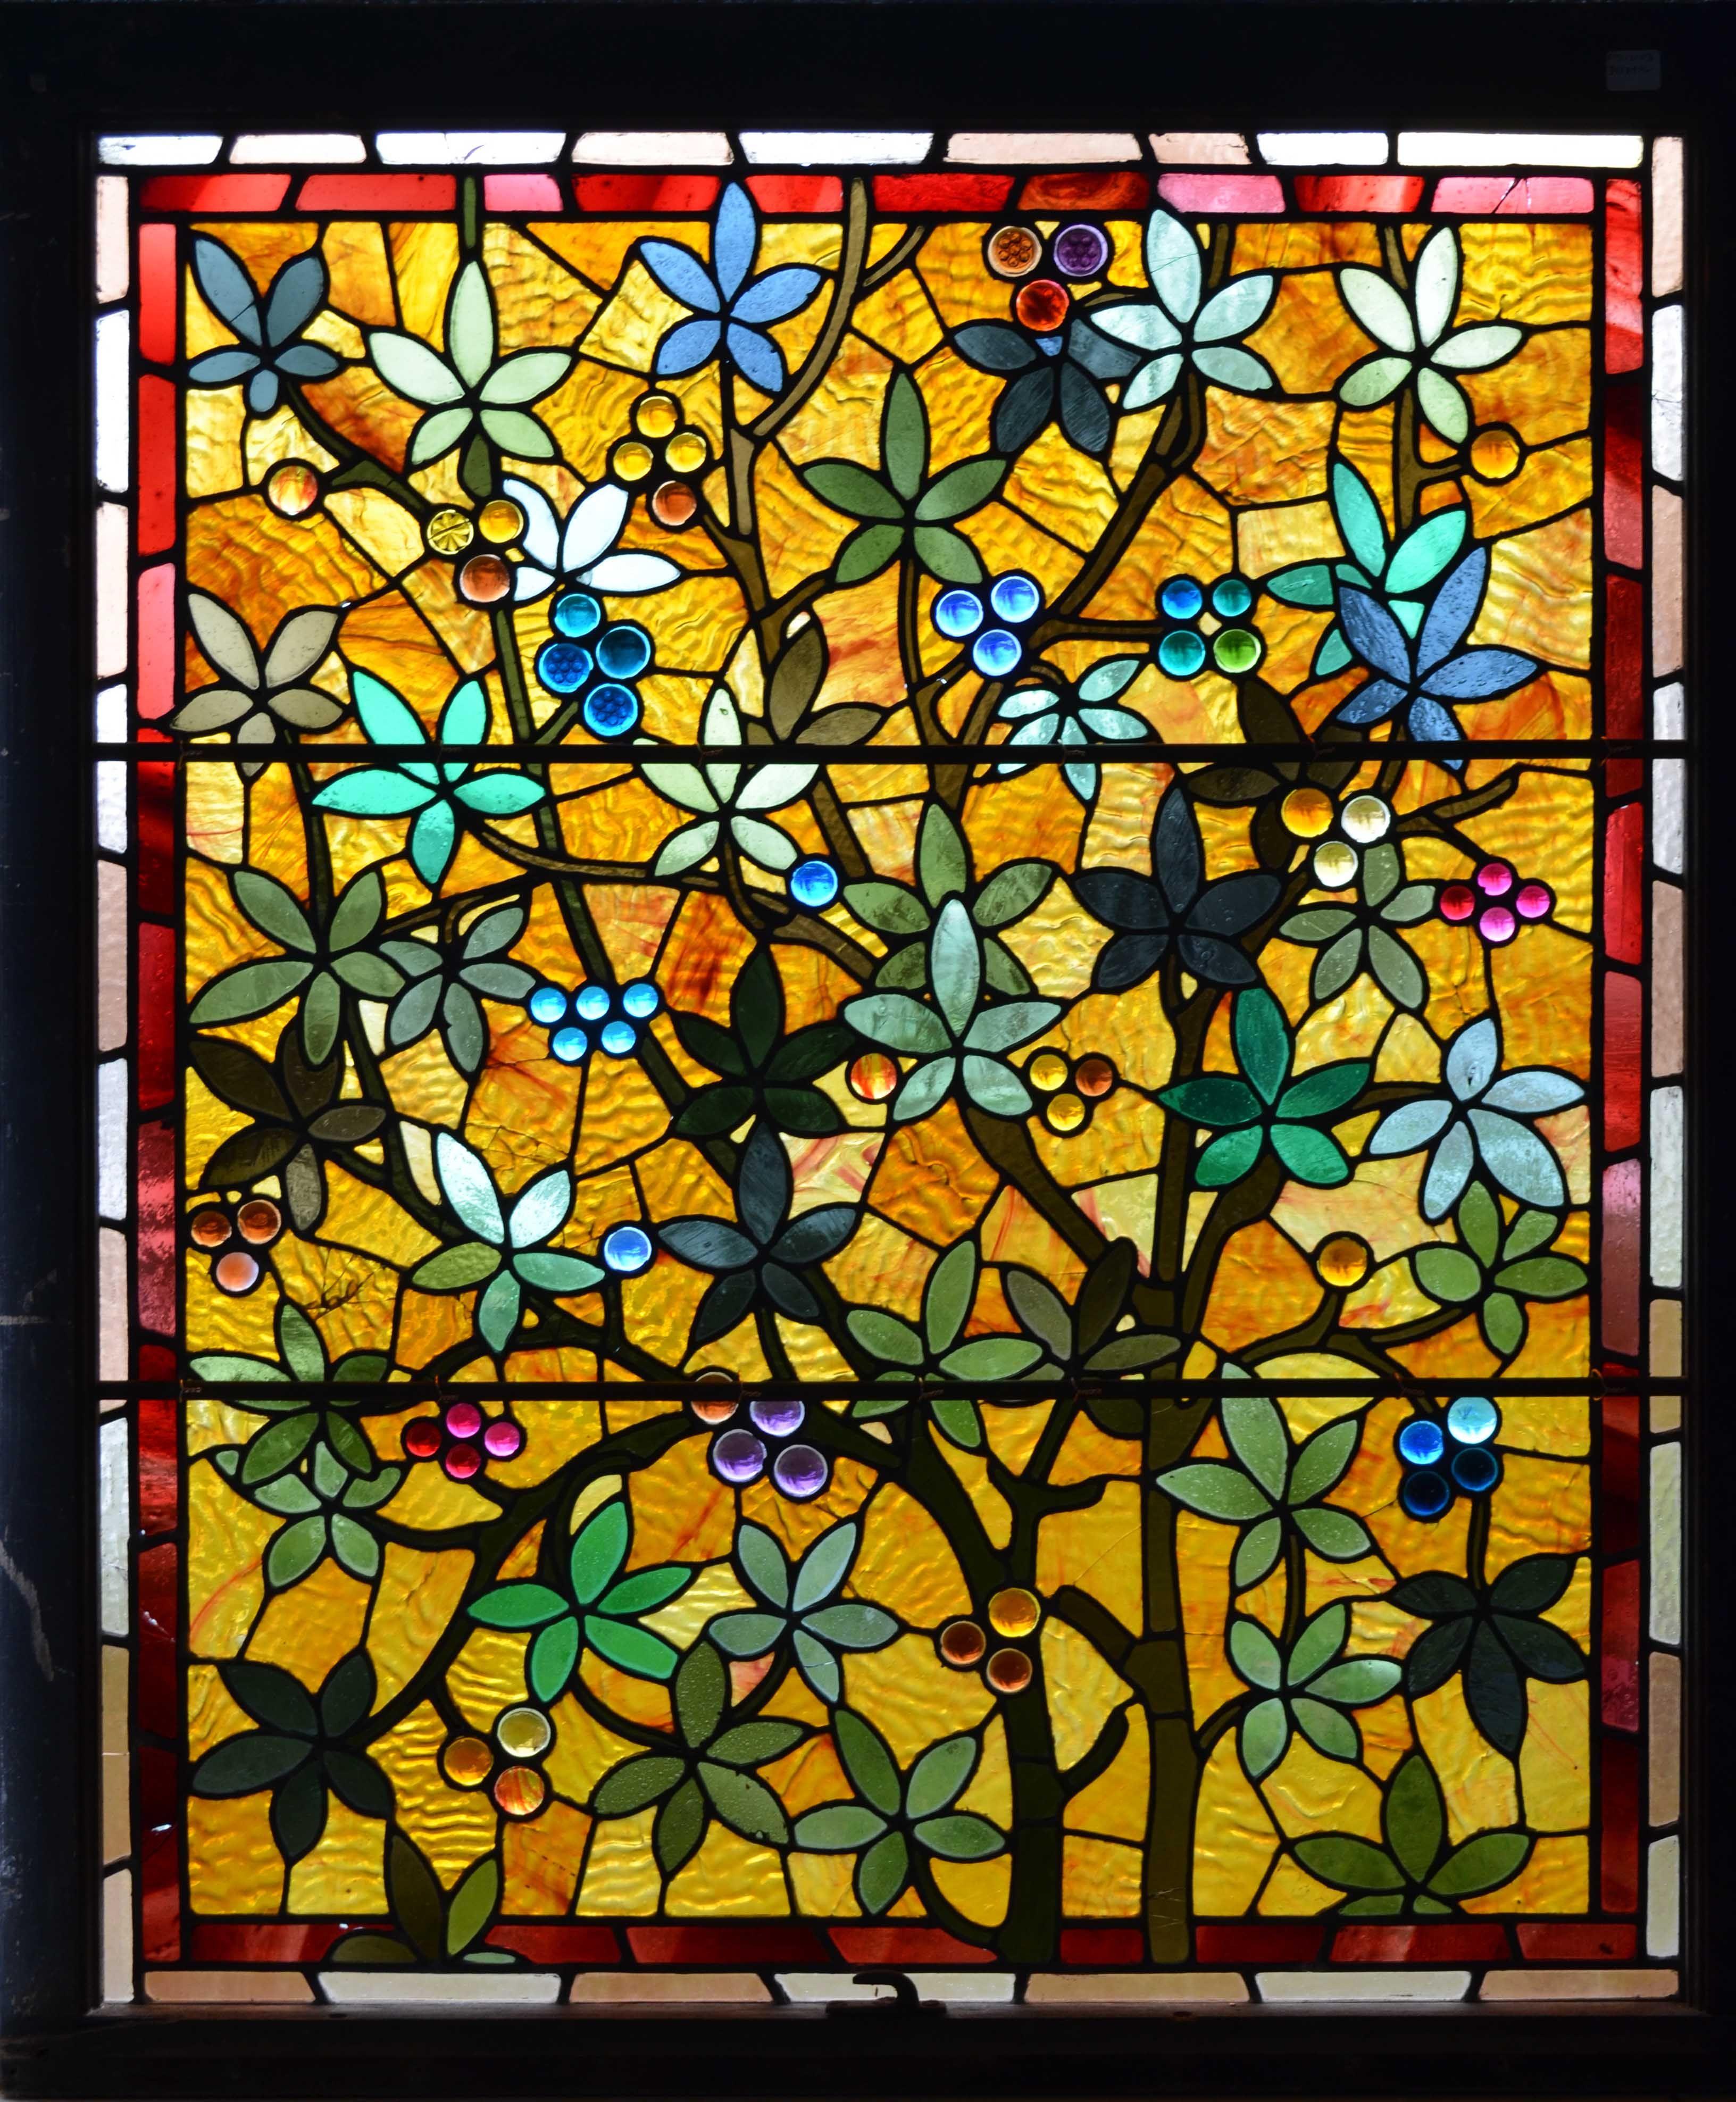 antique american stained glass windows art pinterest buntglasfenster mosaik und glas. Black Bedroom Furniture Sets. Home Design Ideas